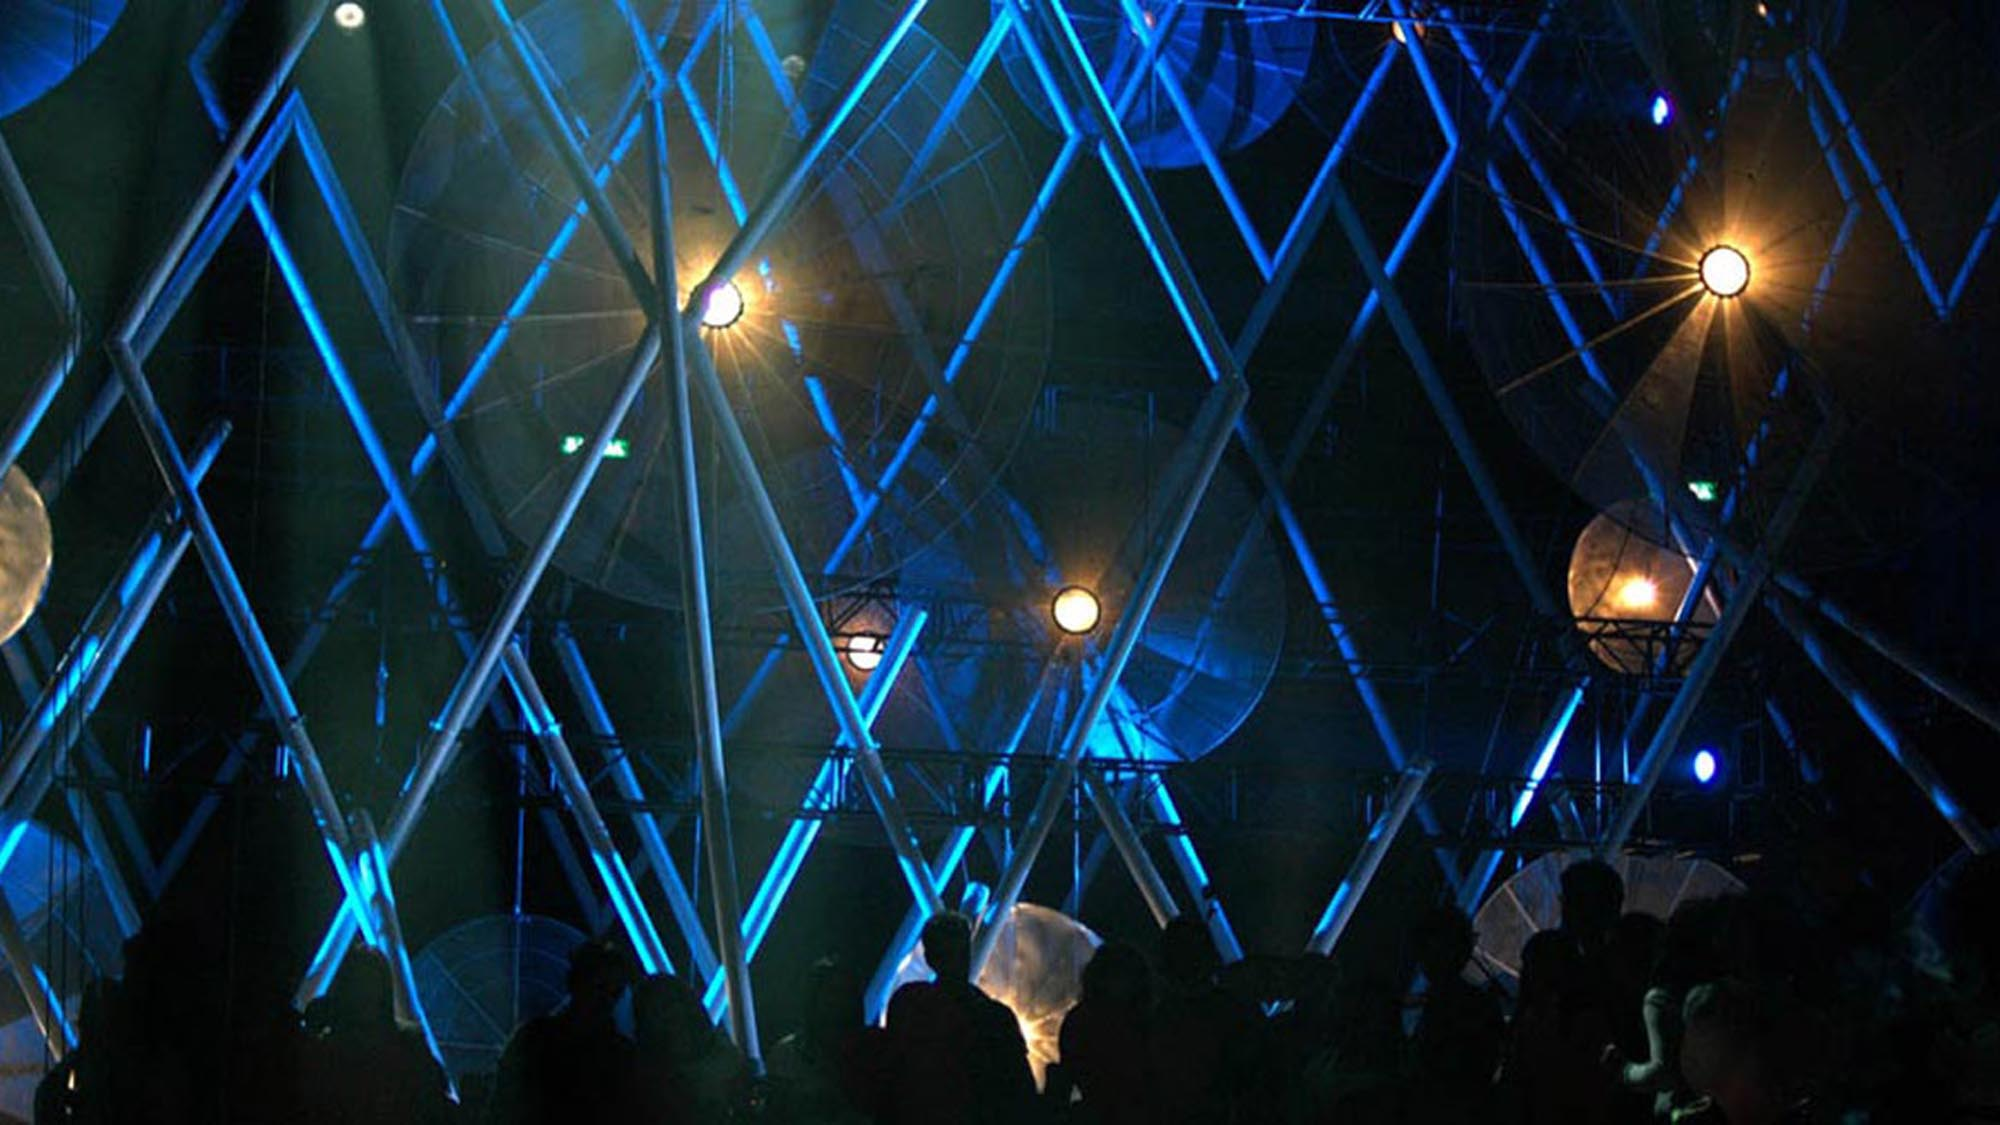 Los-Premios_07_07-smsized